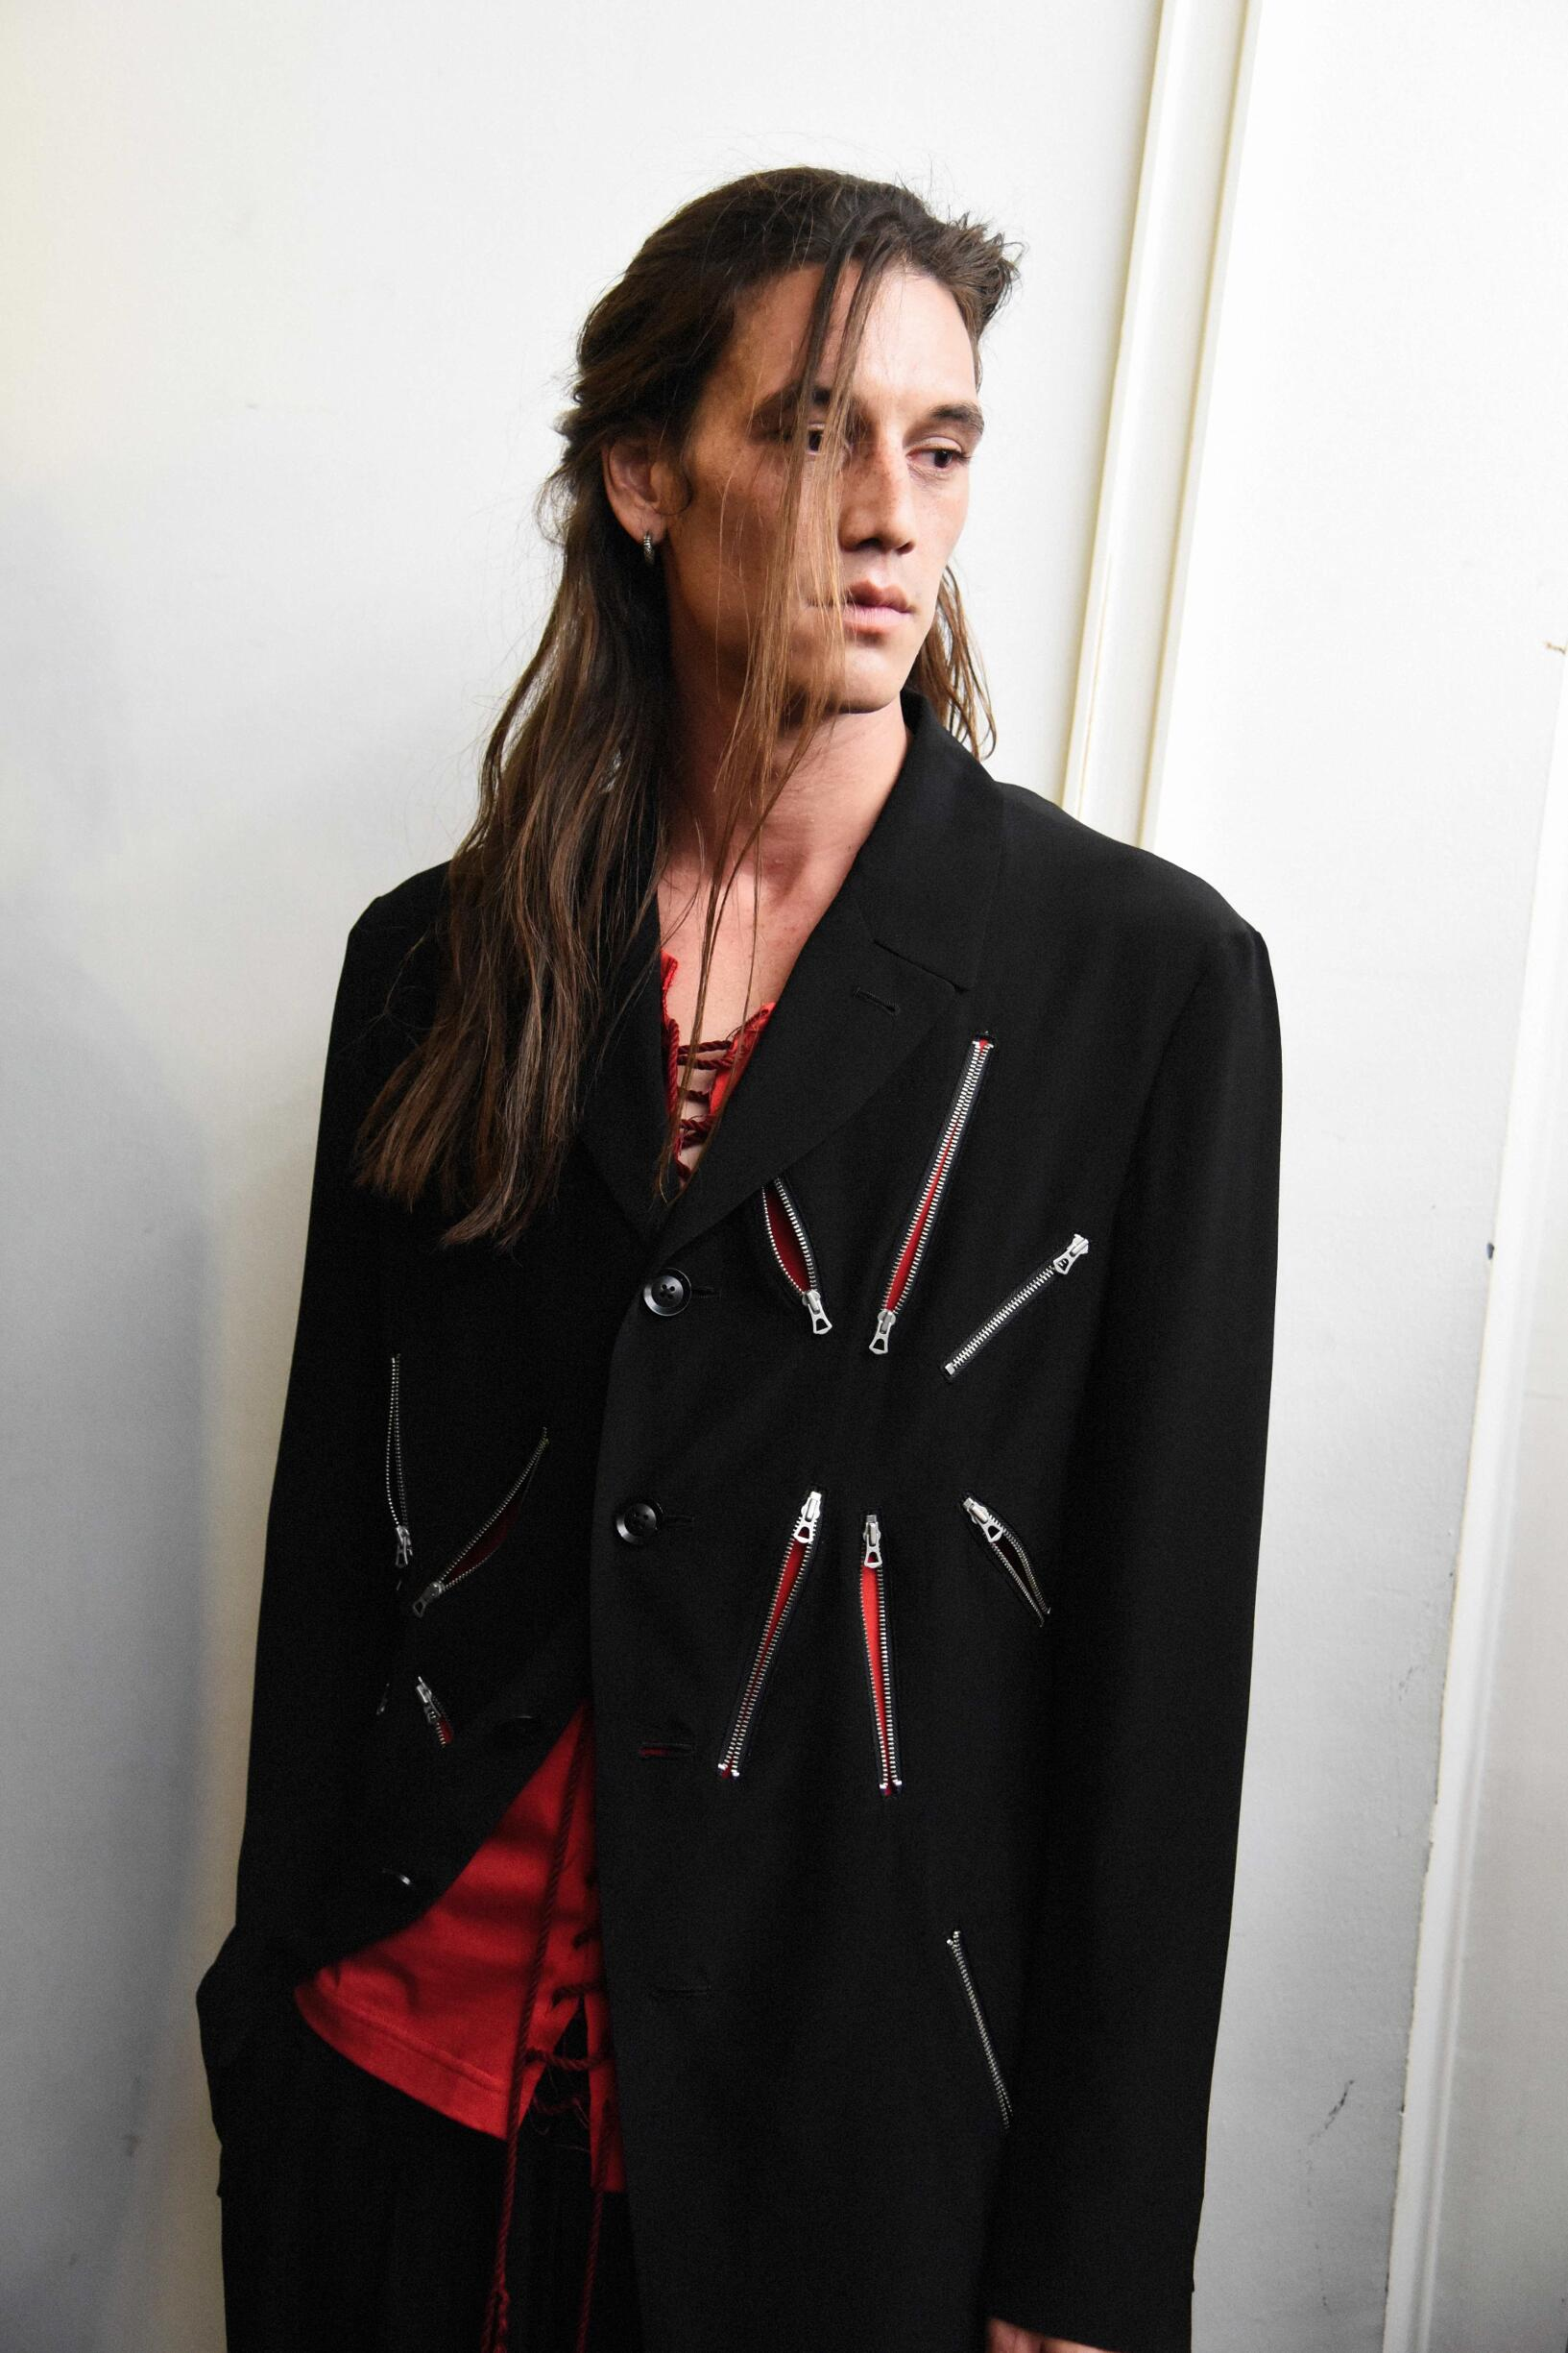 Fashion Model Backstage Yohji Yamamoto Spring Summer 2019 Collection